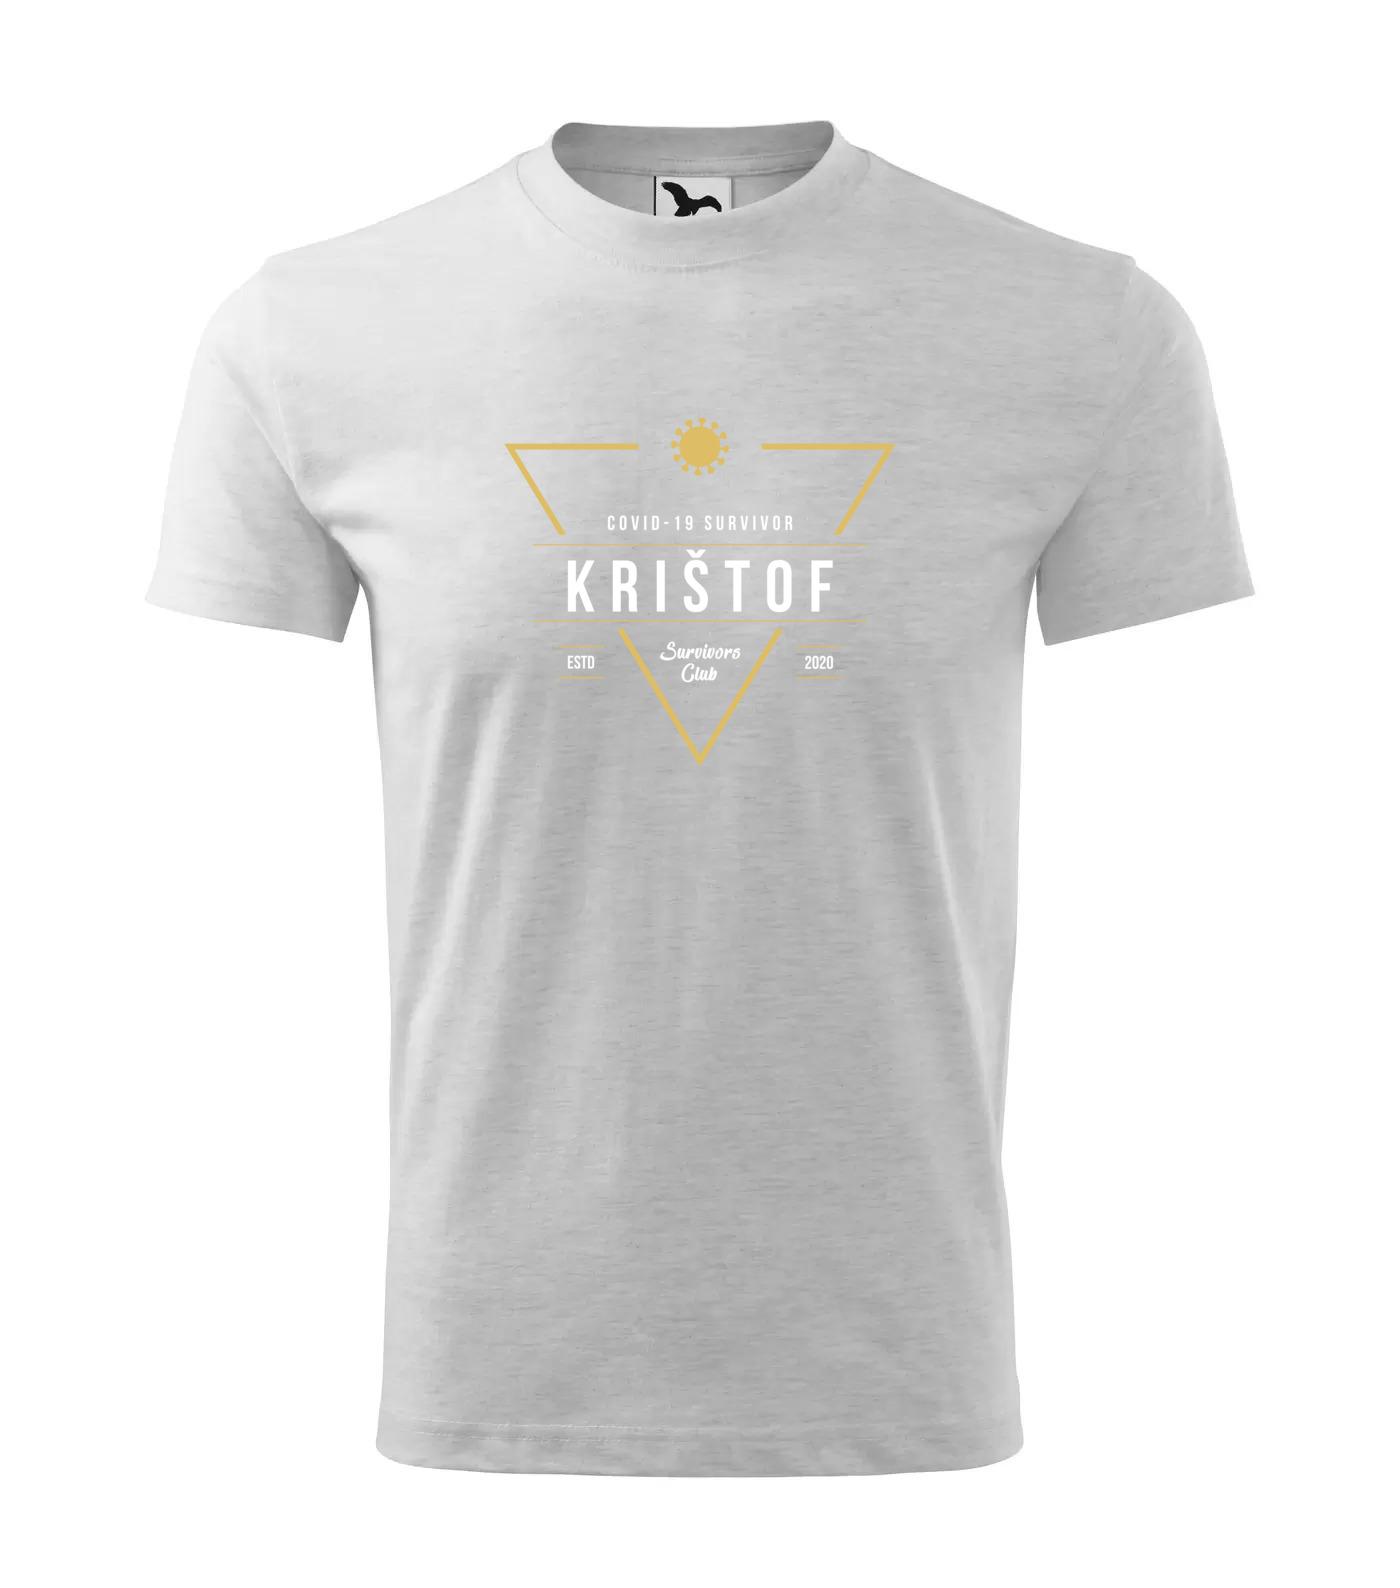 Tričko Survivor Club Krištof